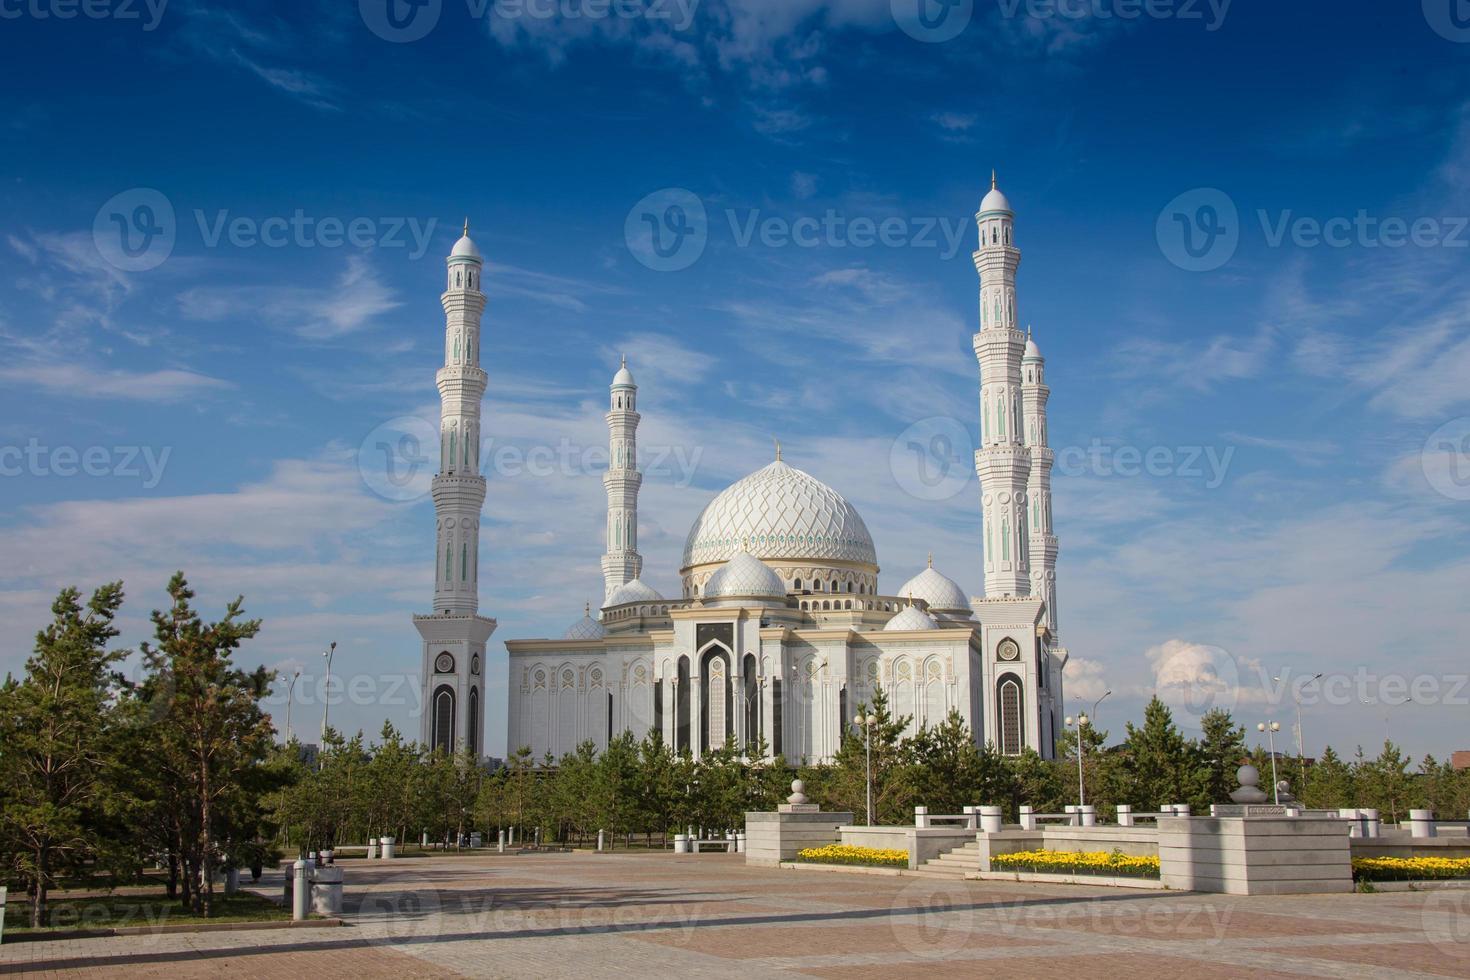 Moschea Yeni Cami ad Astsana, Kazakistan foto